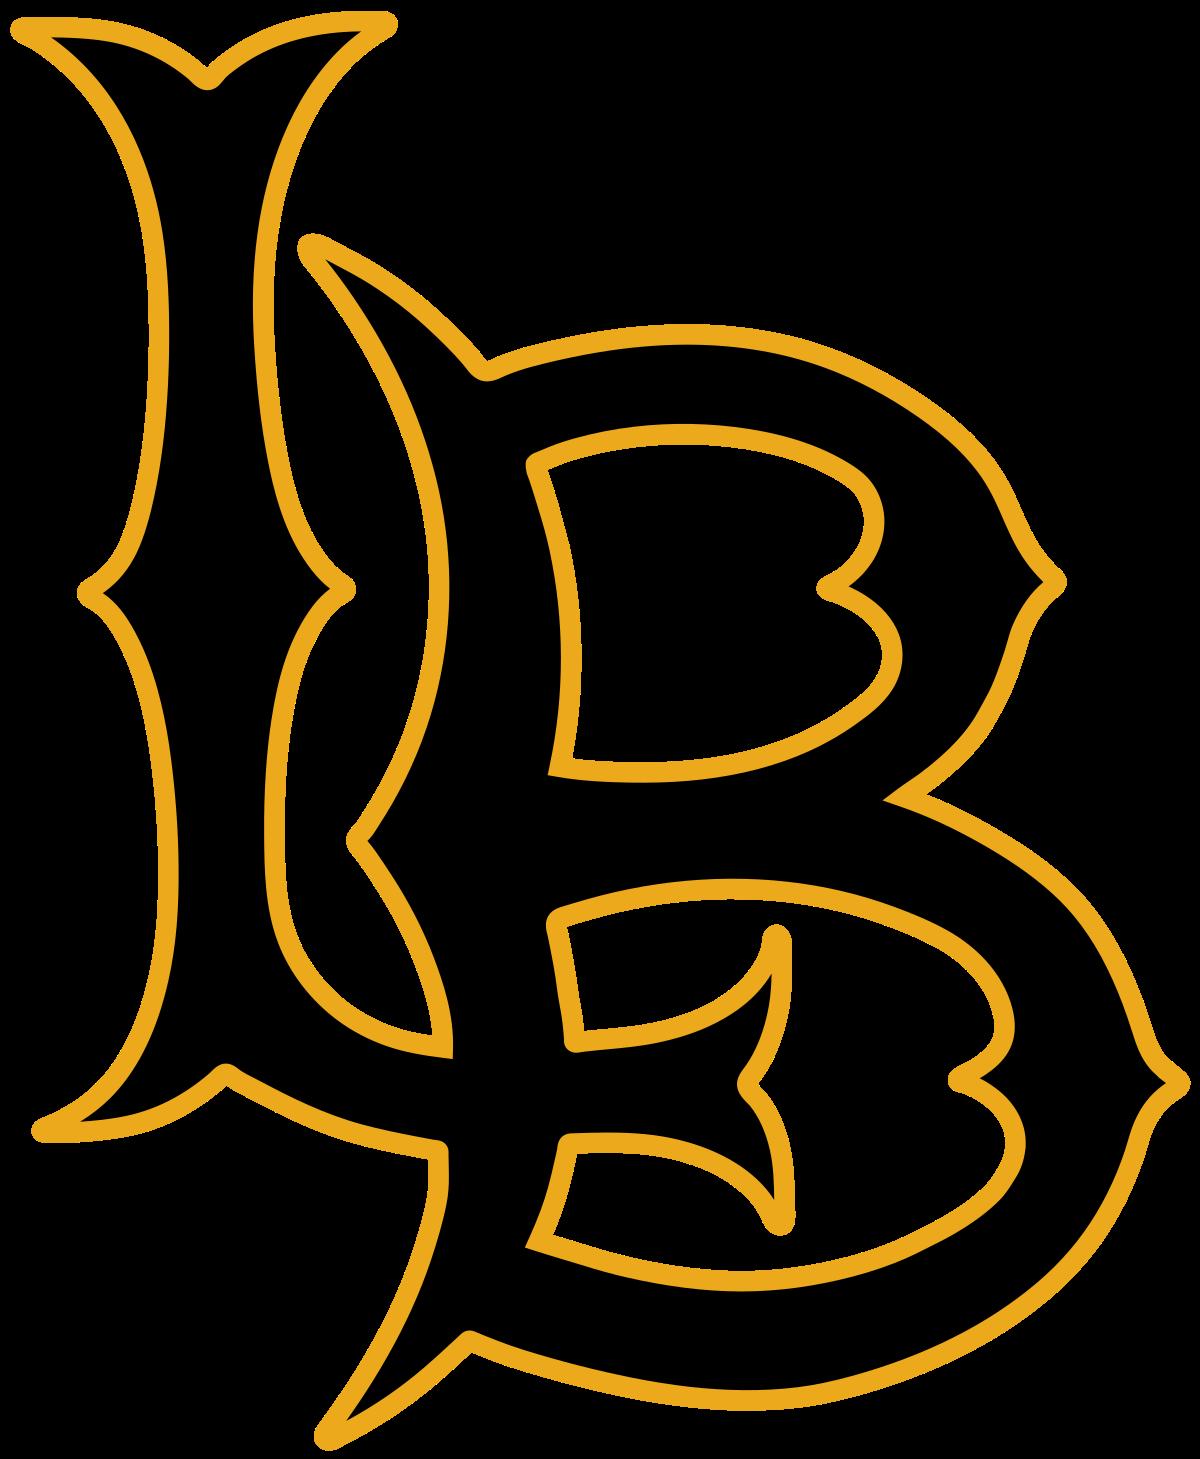 Baseball tear clipart svg free library Long Beach State Dirtbags baseball - Wikipedia svg free library